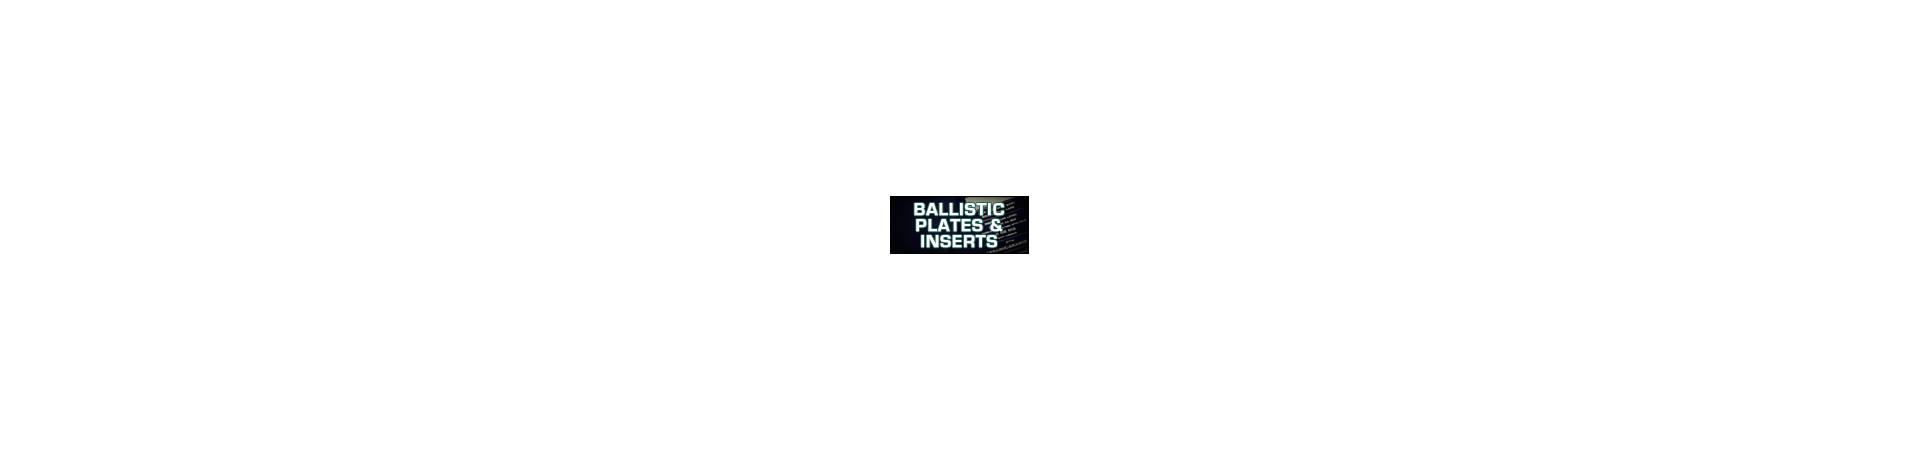 Ballistic Plates & Inserts